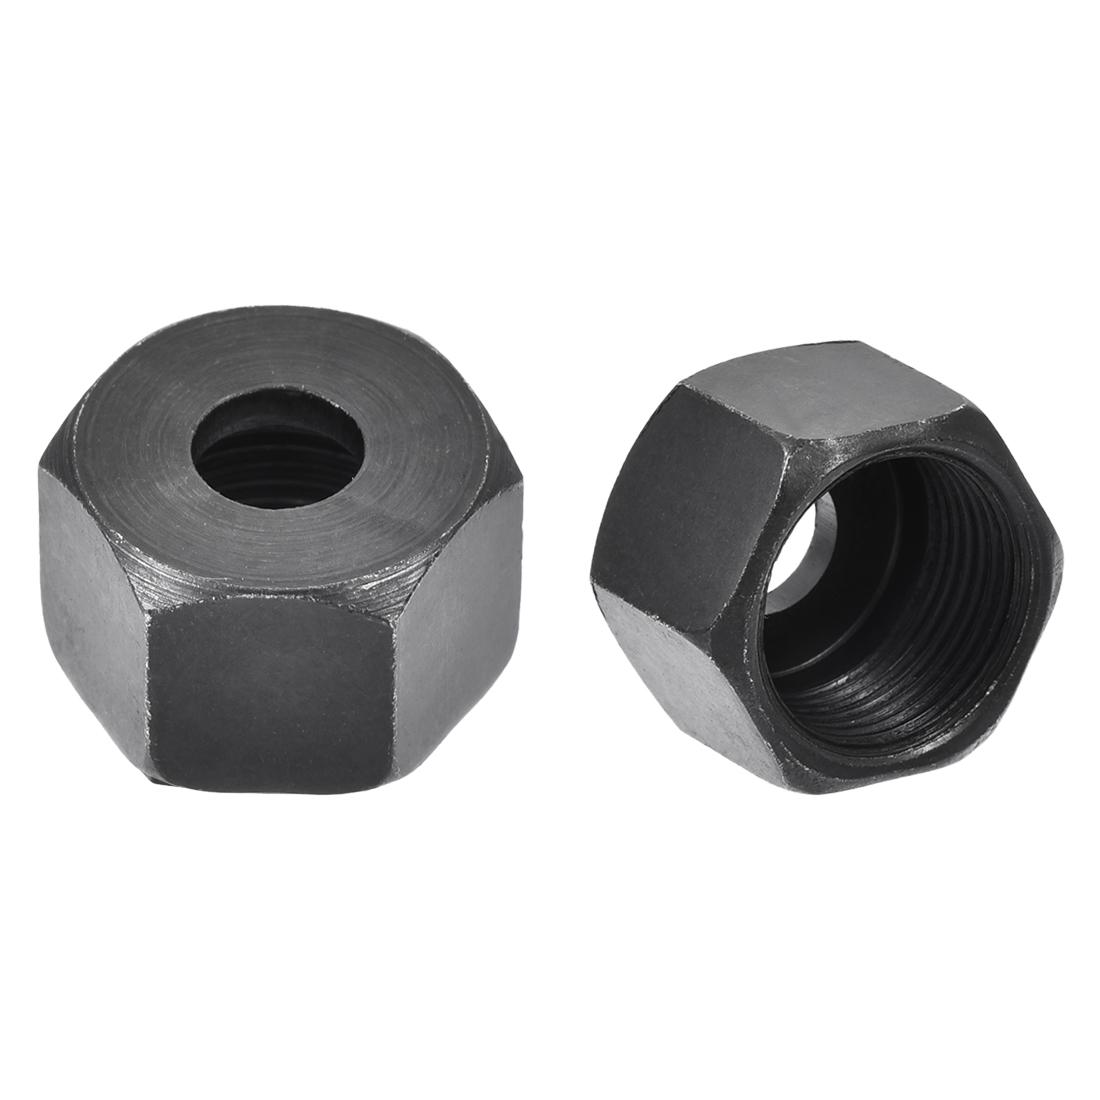 13mm Female Thread Dia Hex Type Trimmer Replacement Parts Lock Nut Black 3pcs